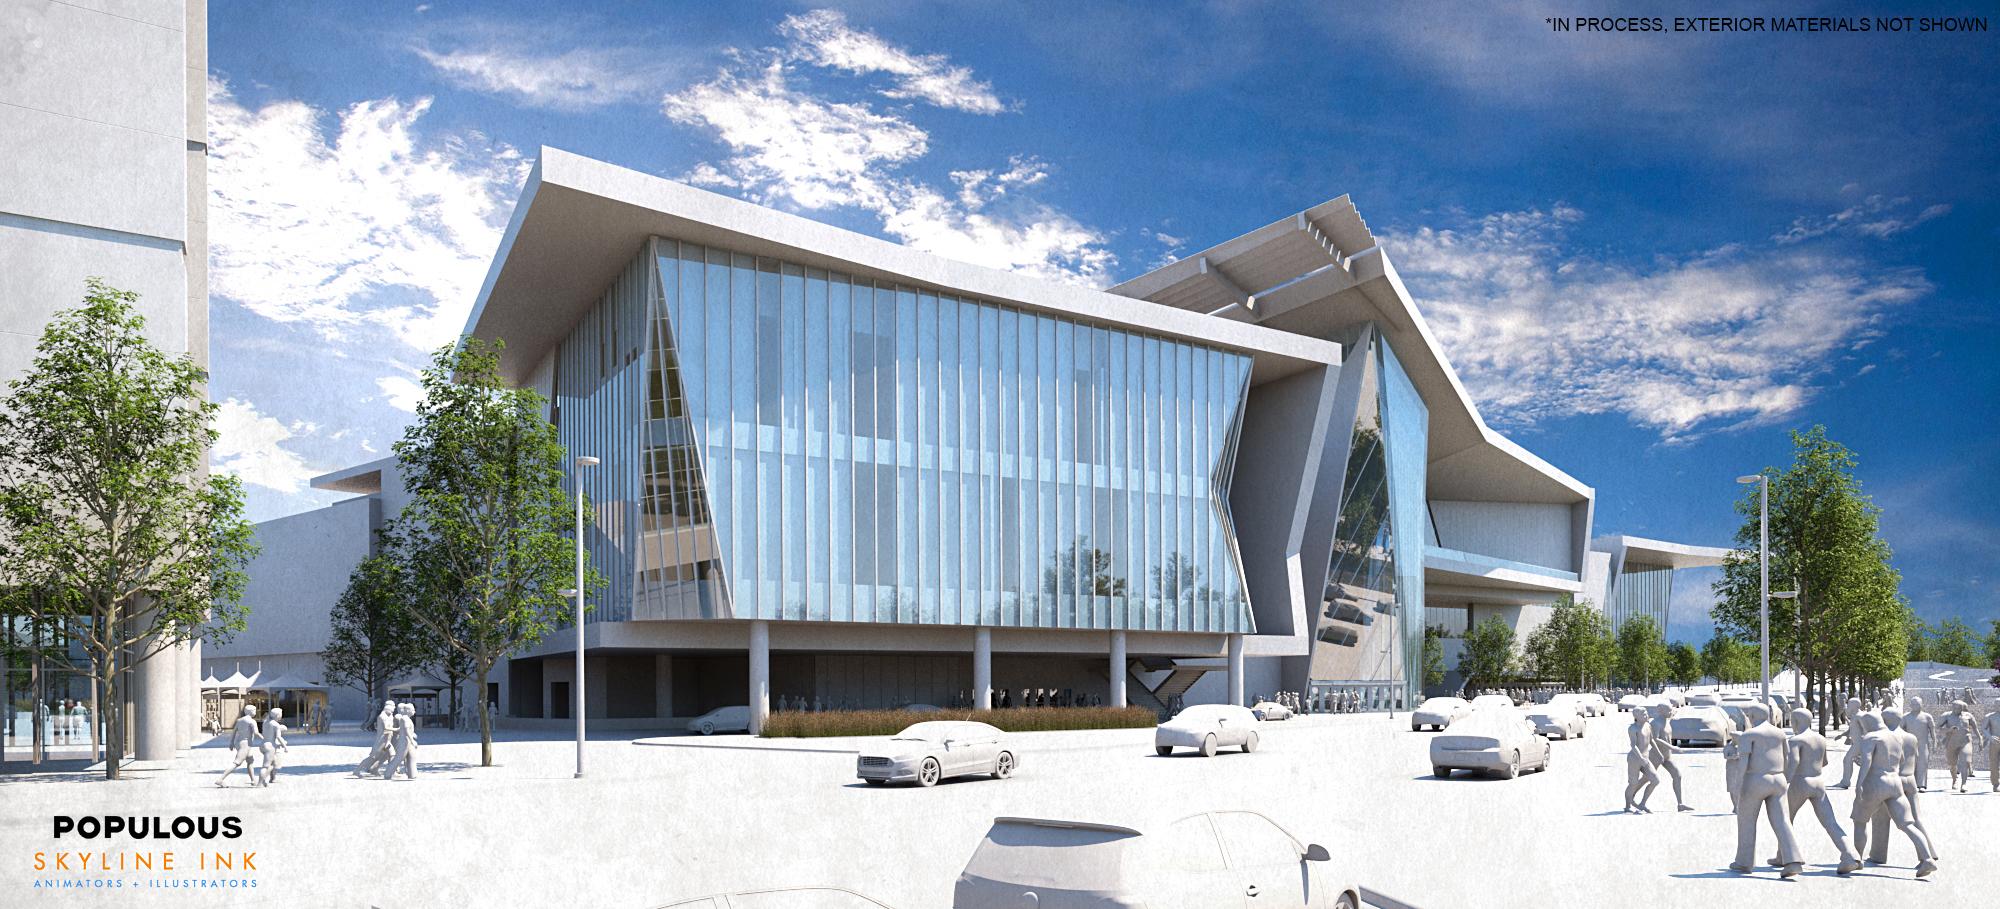 MAPS 3 Convention Center preliminary design 4